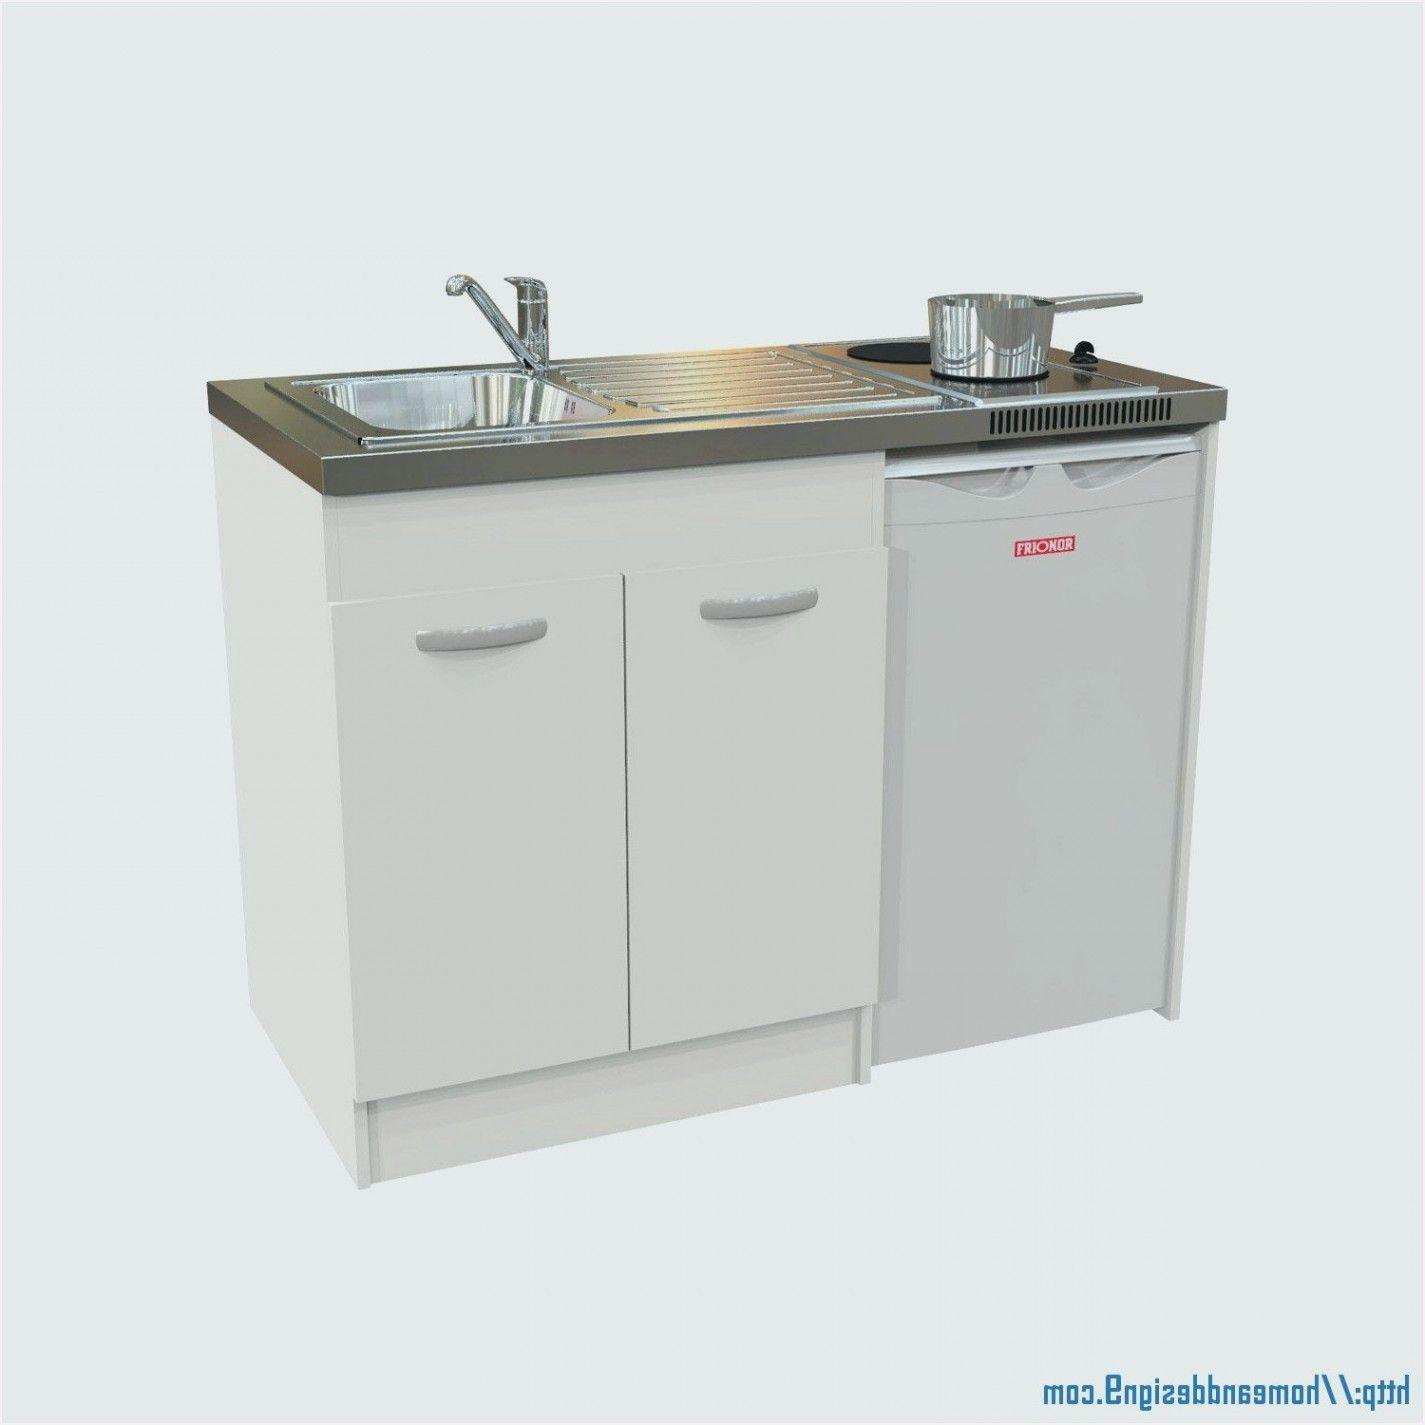 Best Of Armoire Metallique Brico Depot Cabinet Home Appliances Kitchenette